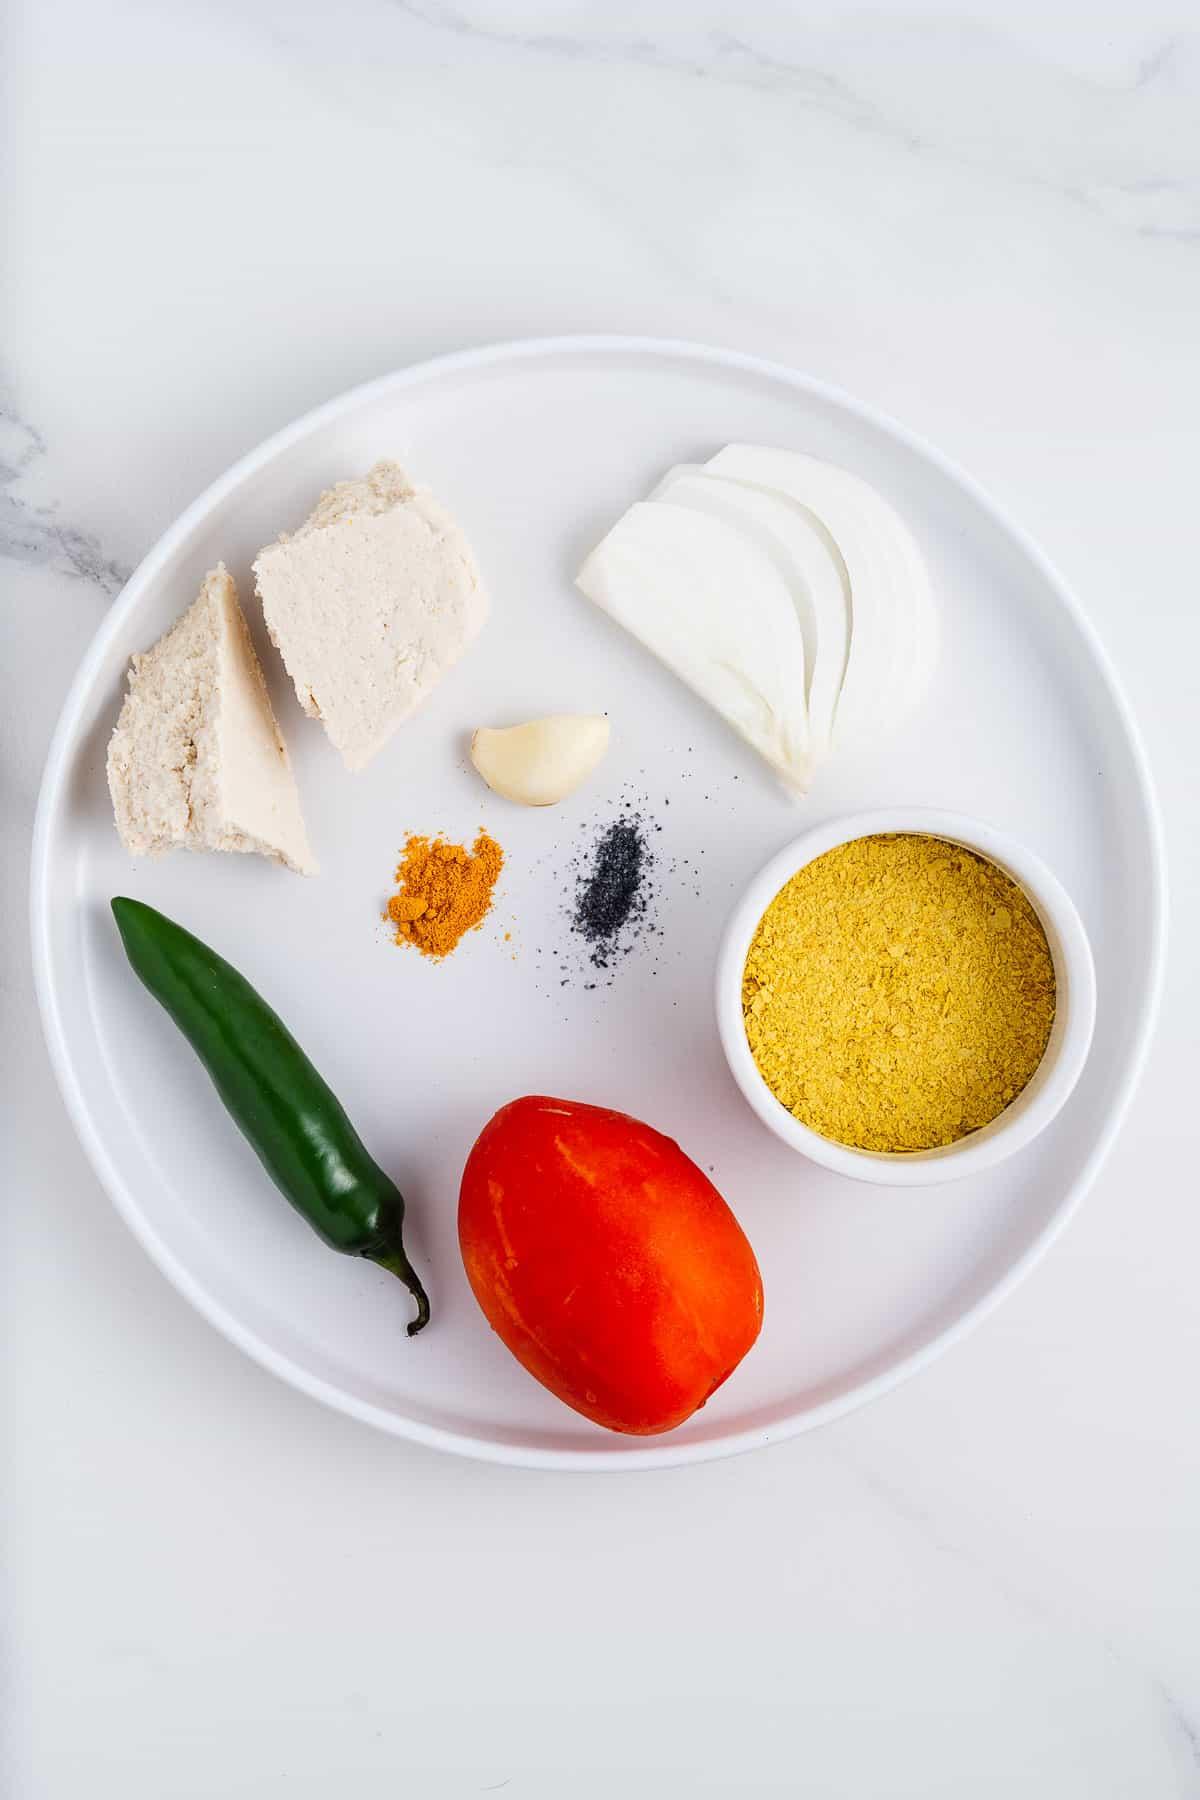 Serrano, Tomatoes, Nutritional Yeast, Onion, Tofu, Garlic, Turmeric, and Salt